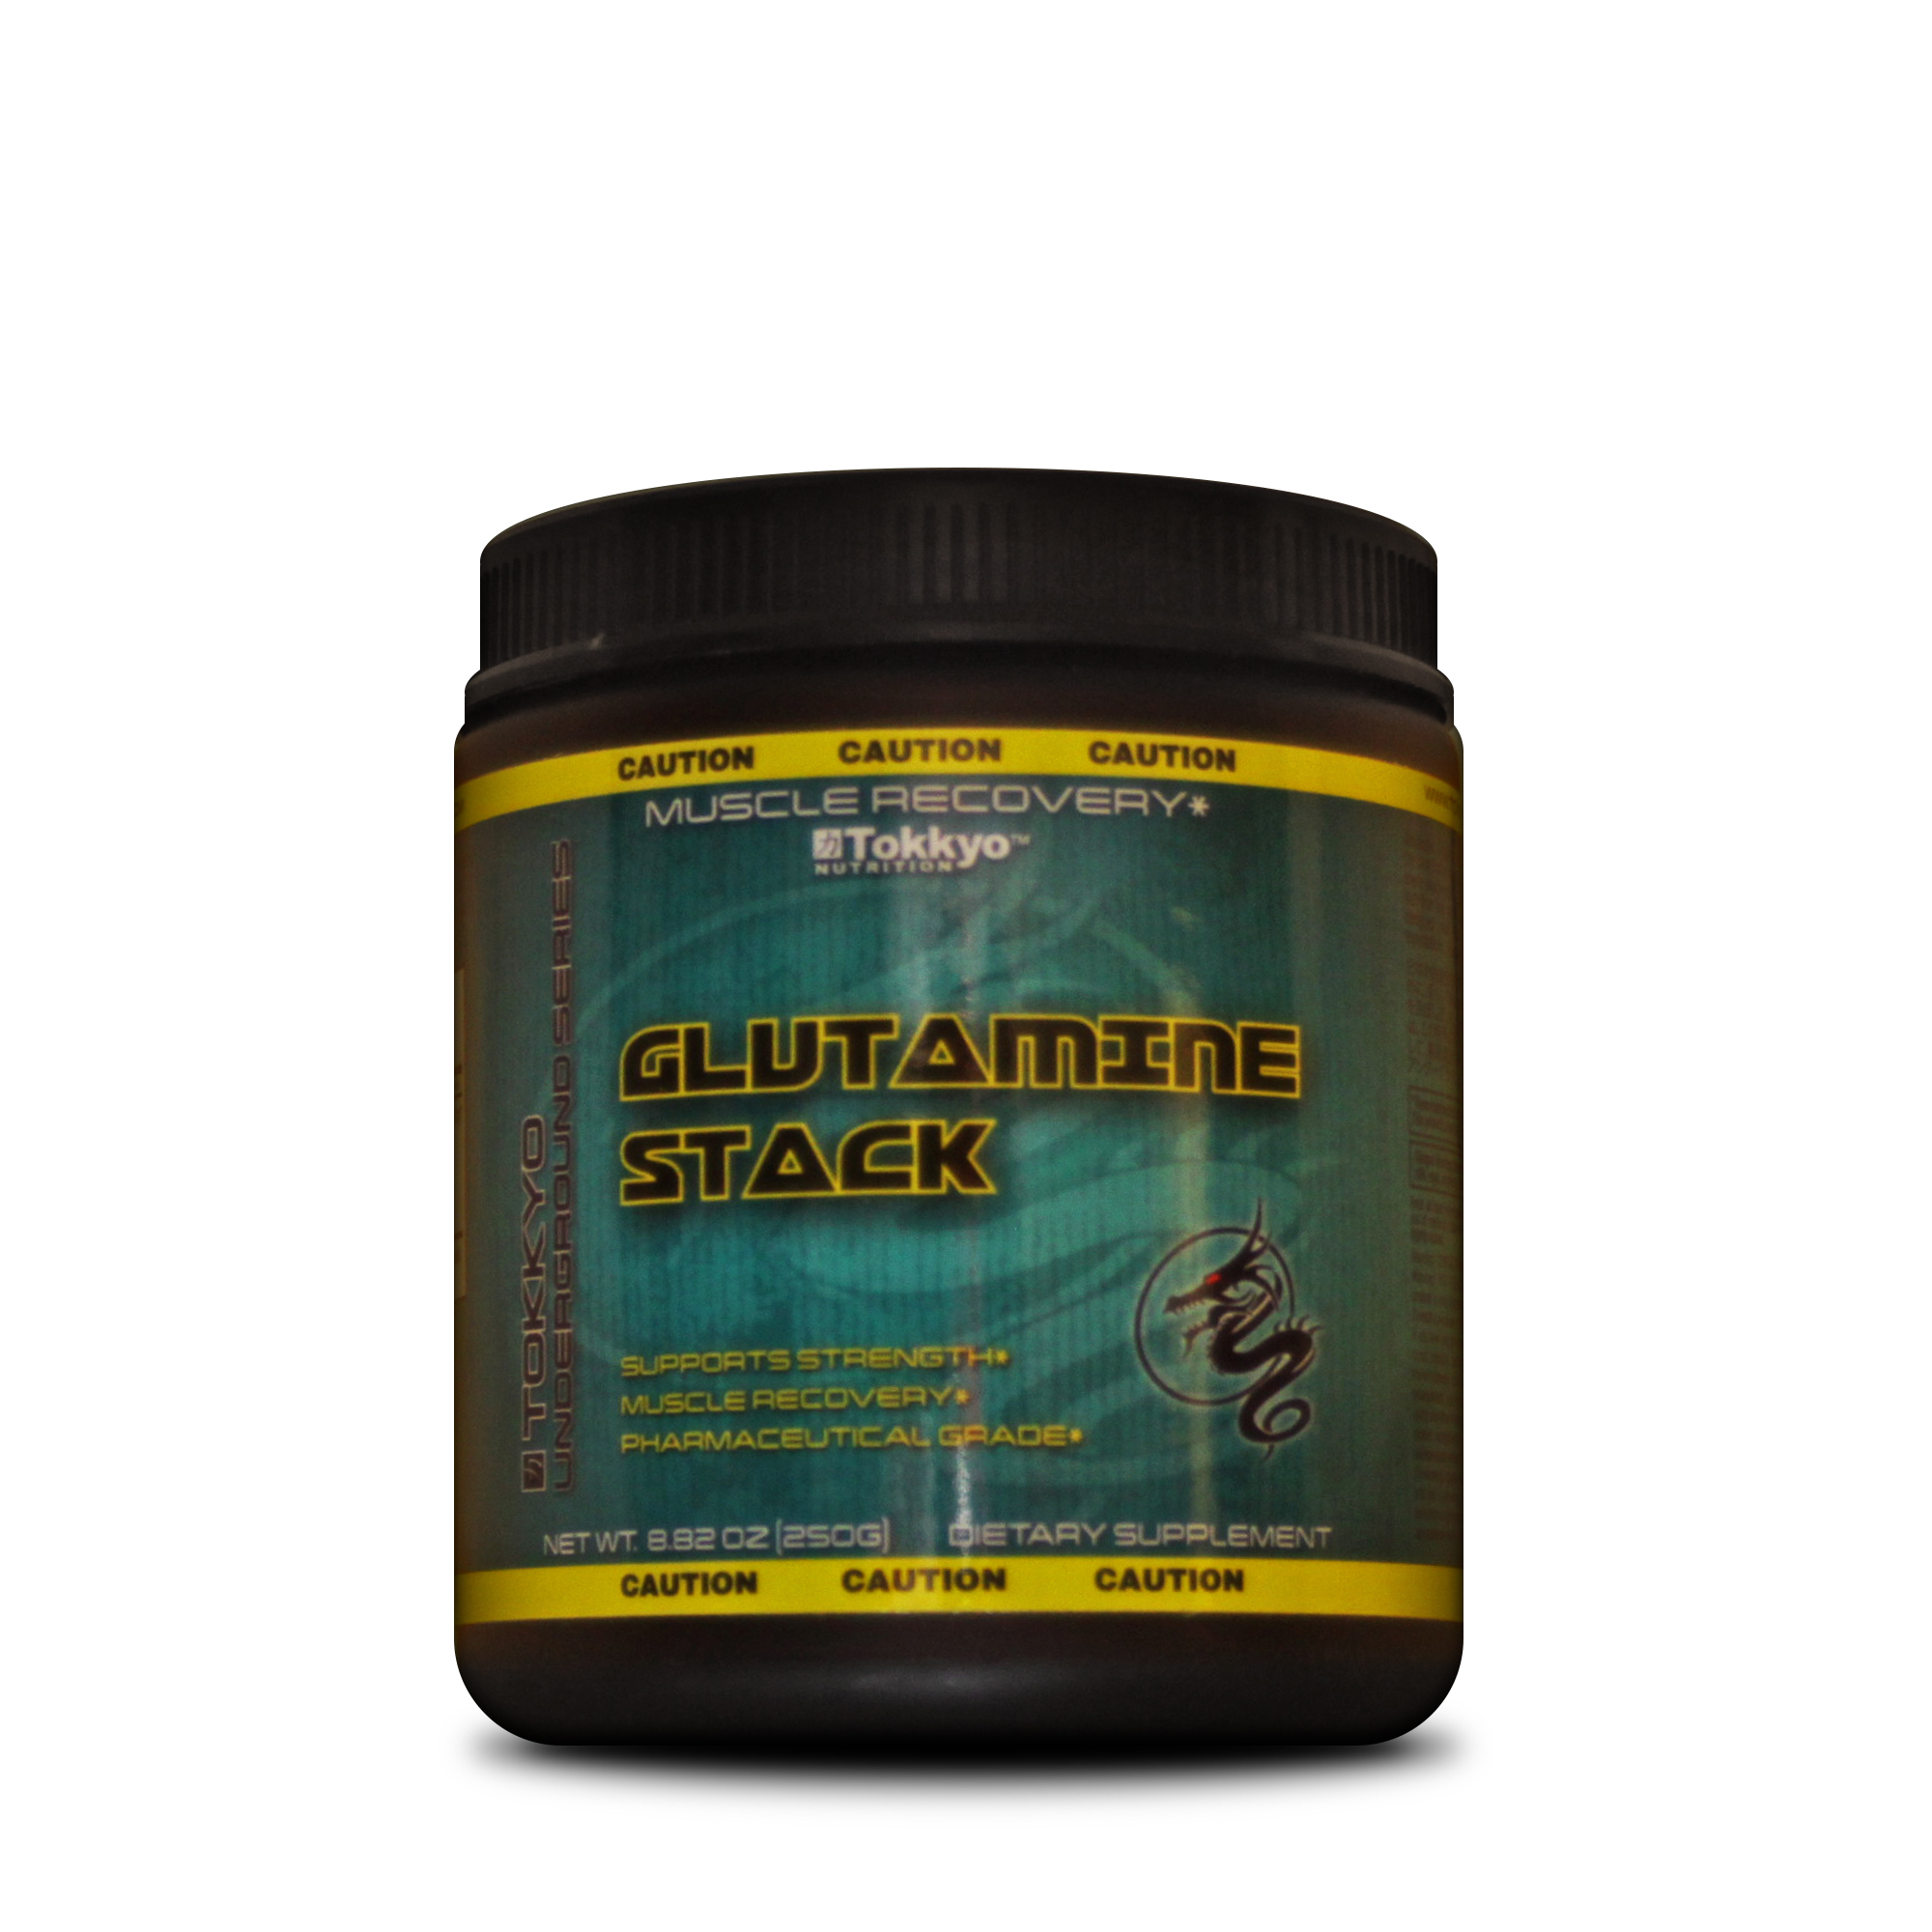 Nitrous Stack Tokkyo Nutrition: Glutamine Stack – Tokkyo Nutrition